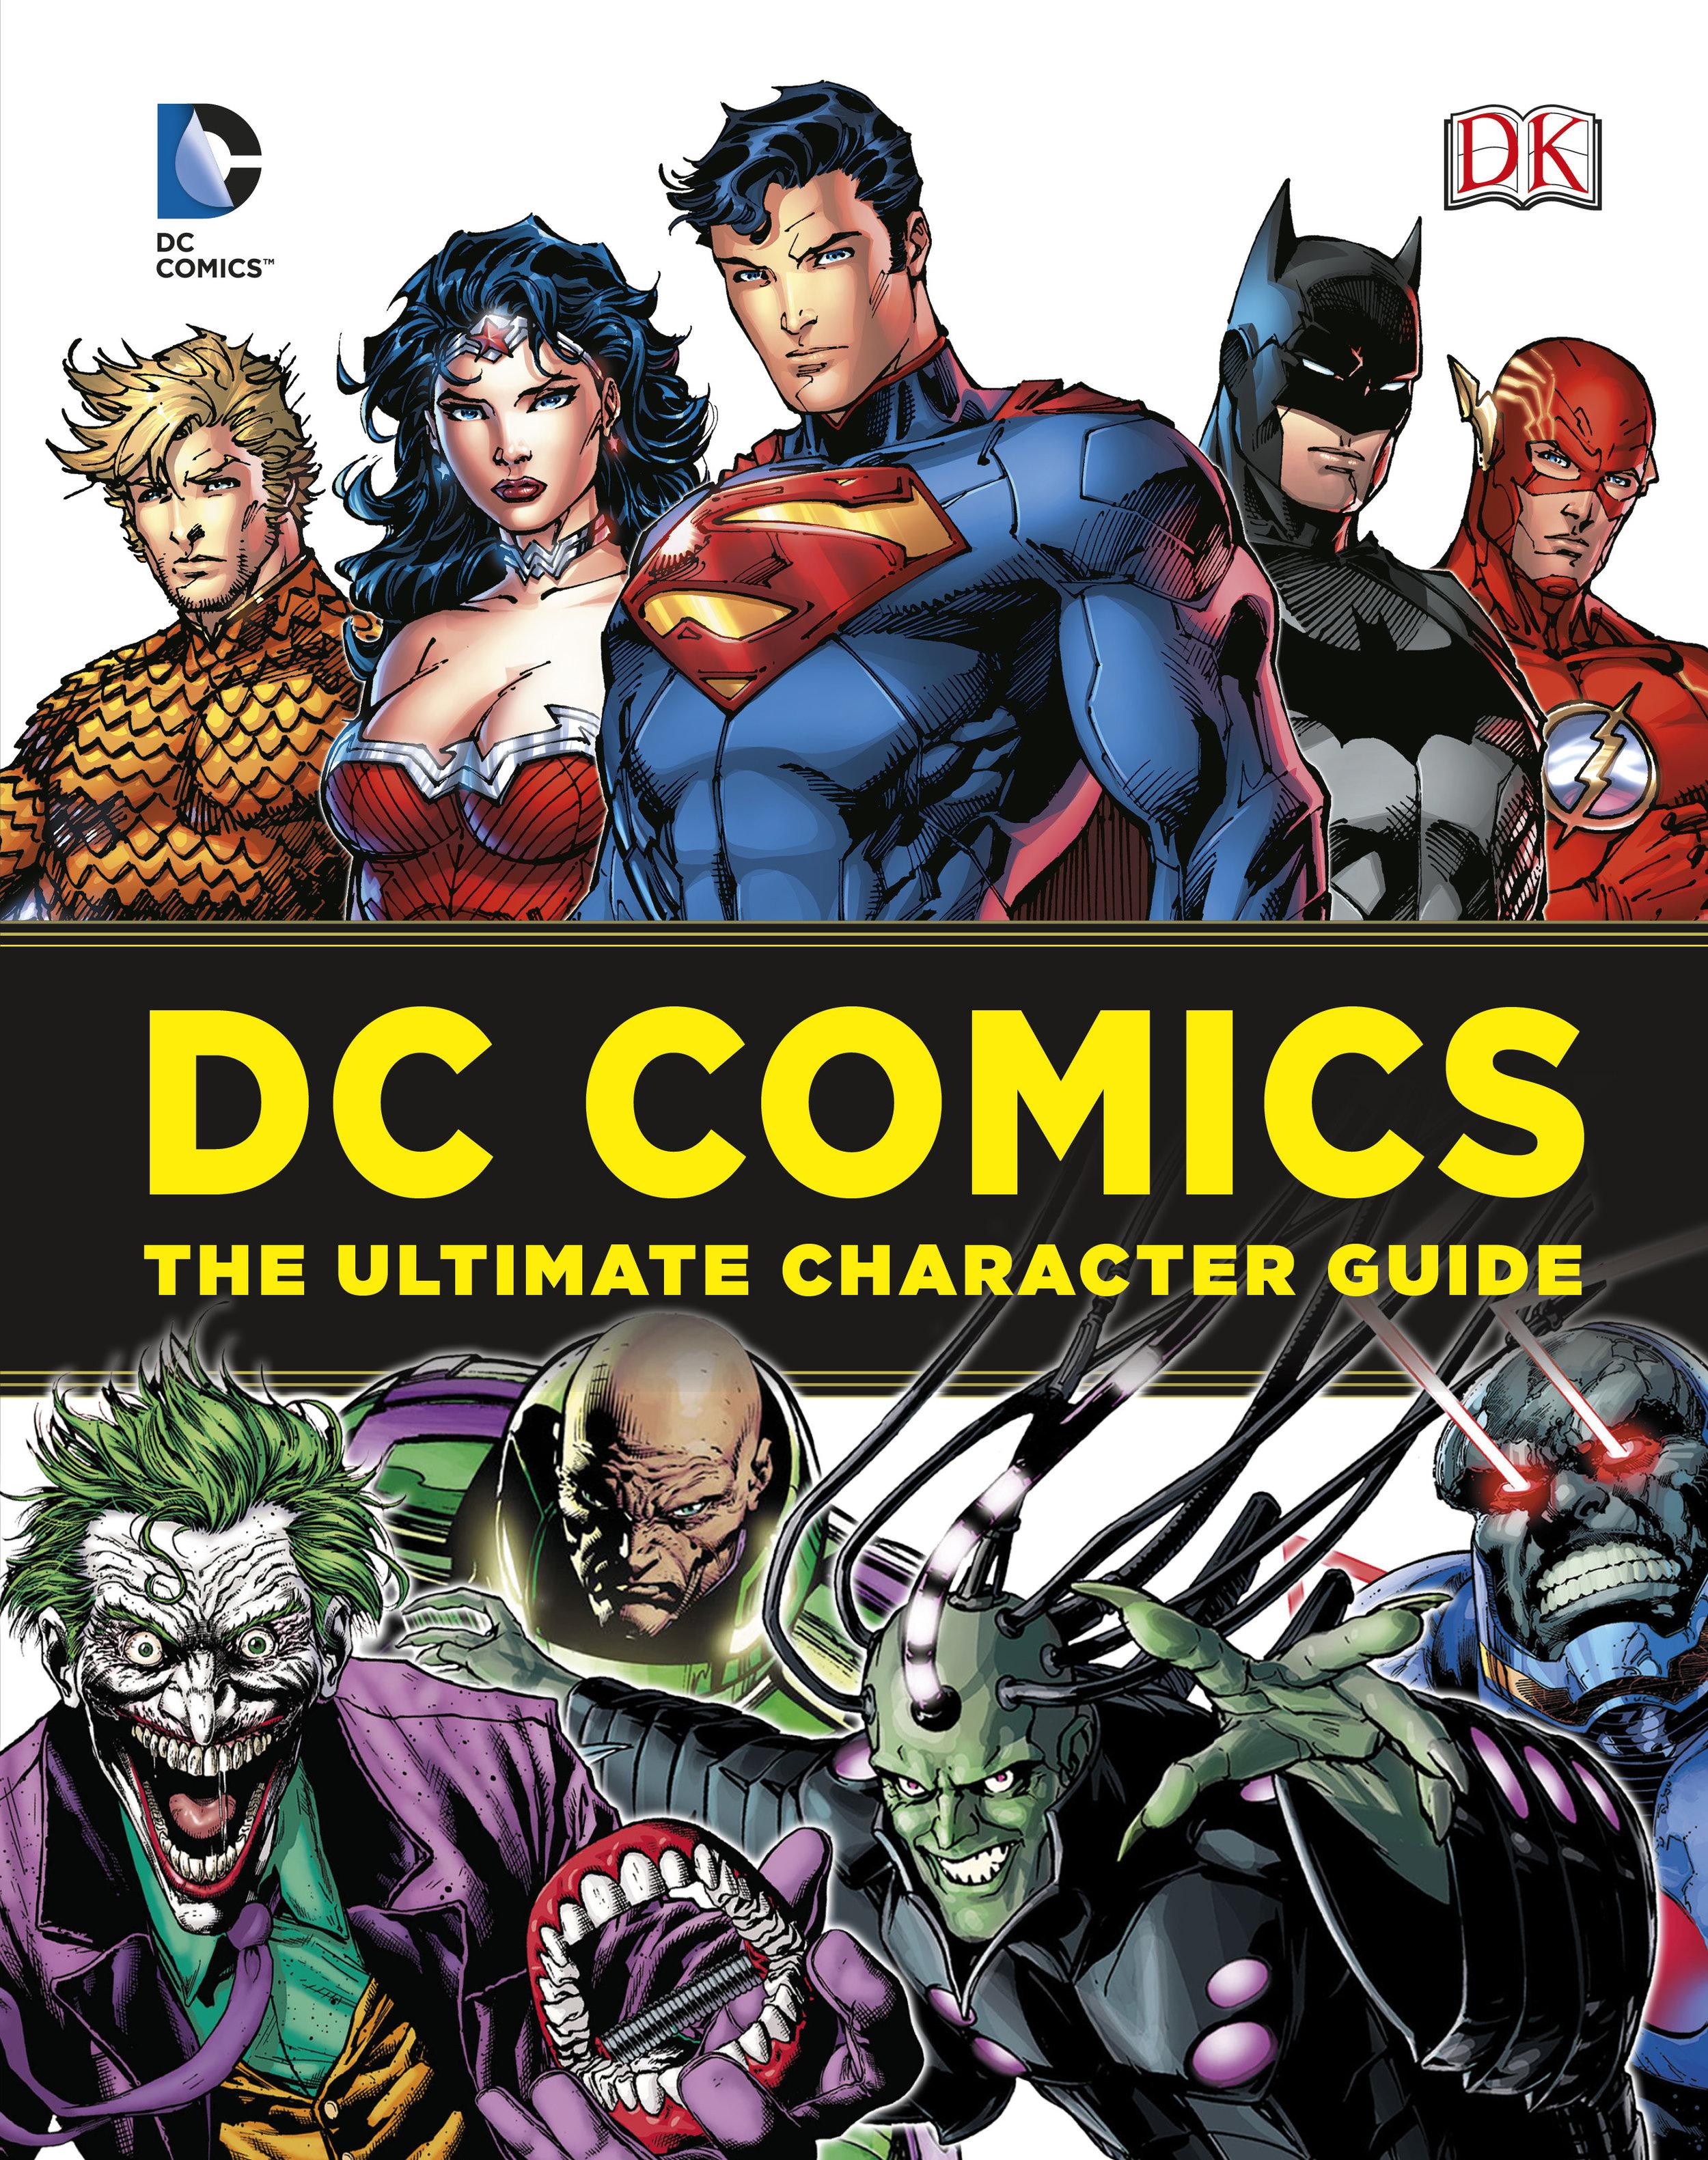 179625_DC_Comics_UG_WIGIG_UK_2016_front.jpg